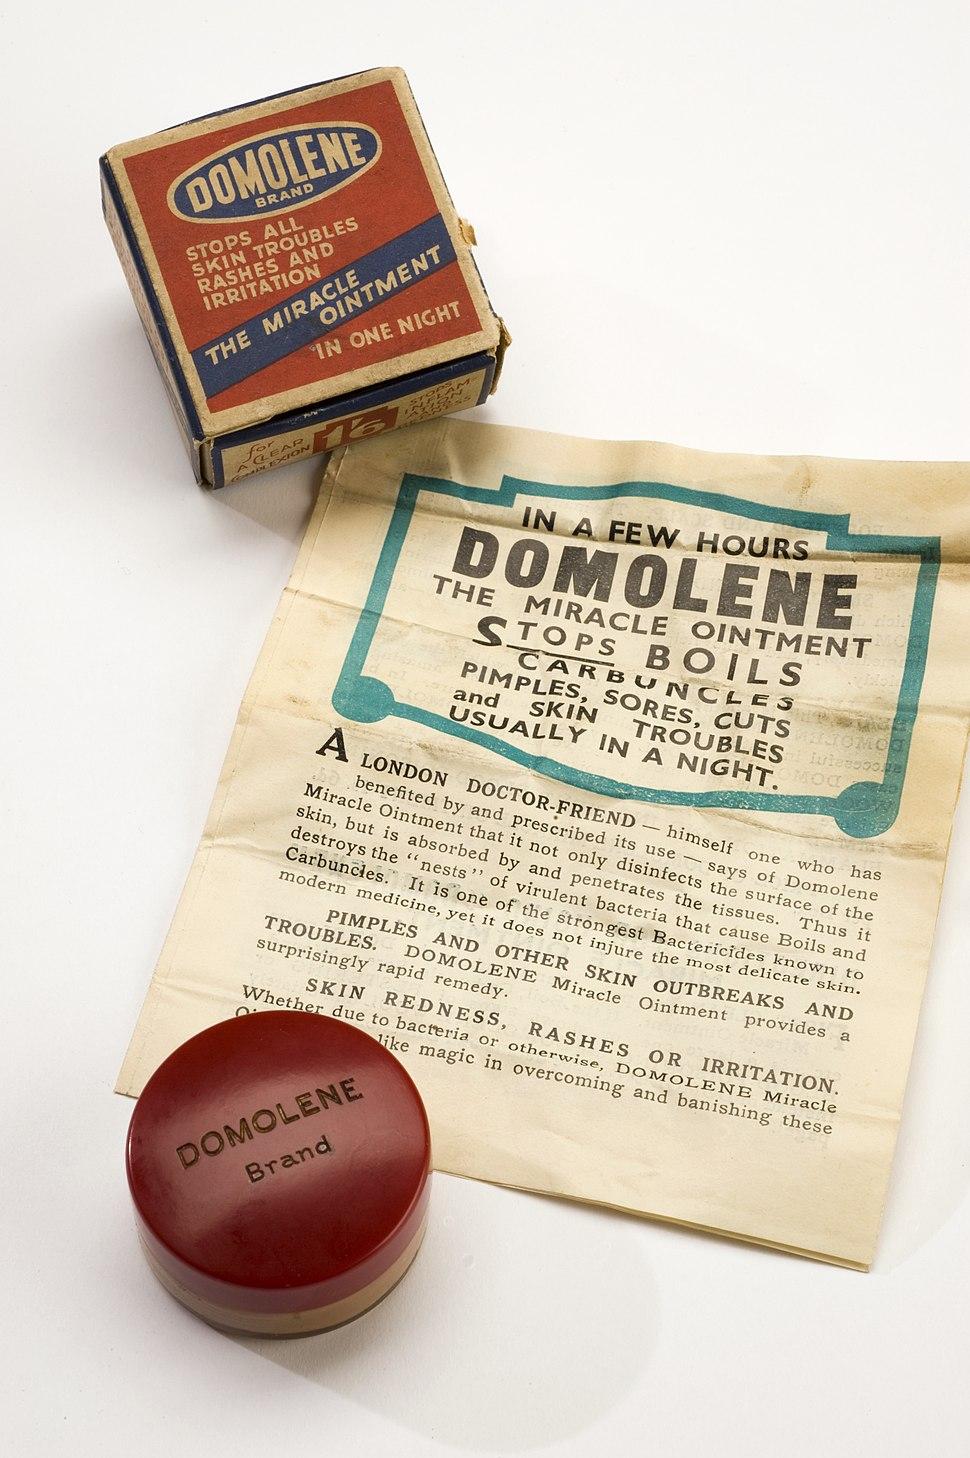 Jar of 'Domolene' ointment, London, England, 1945-1965 Wellcome L0058221